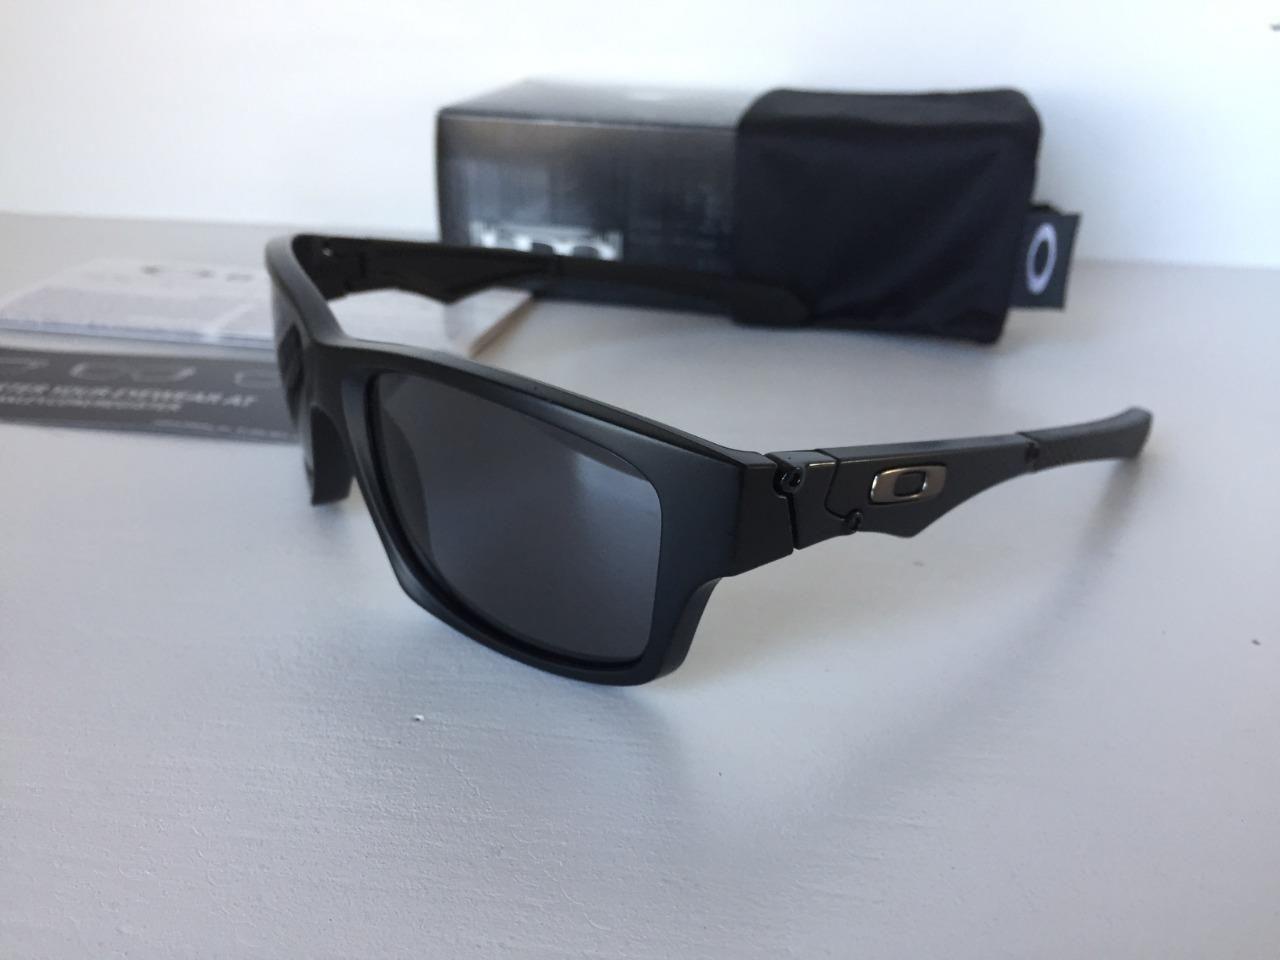 26410e5a18 New Oakley Jupiter Squared Polarized Sunglasses Matte Black Grey OO9135-25